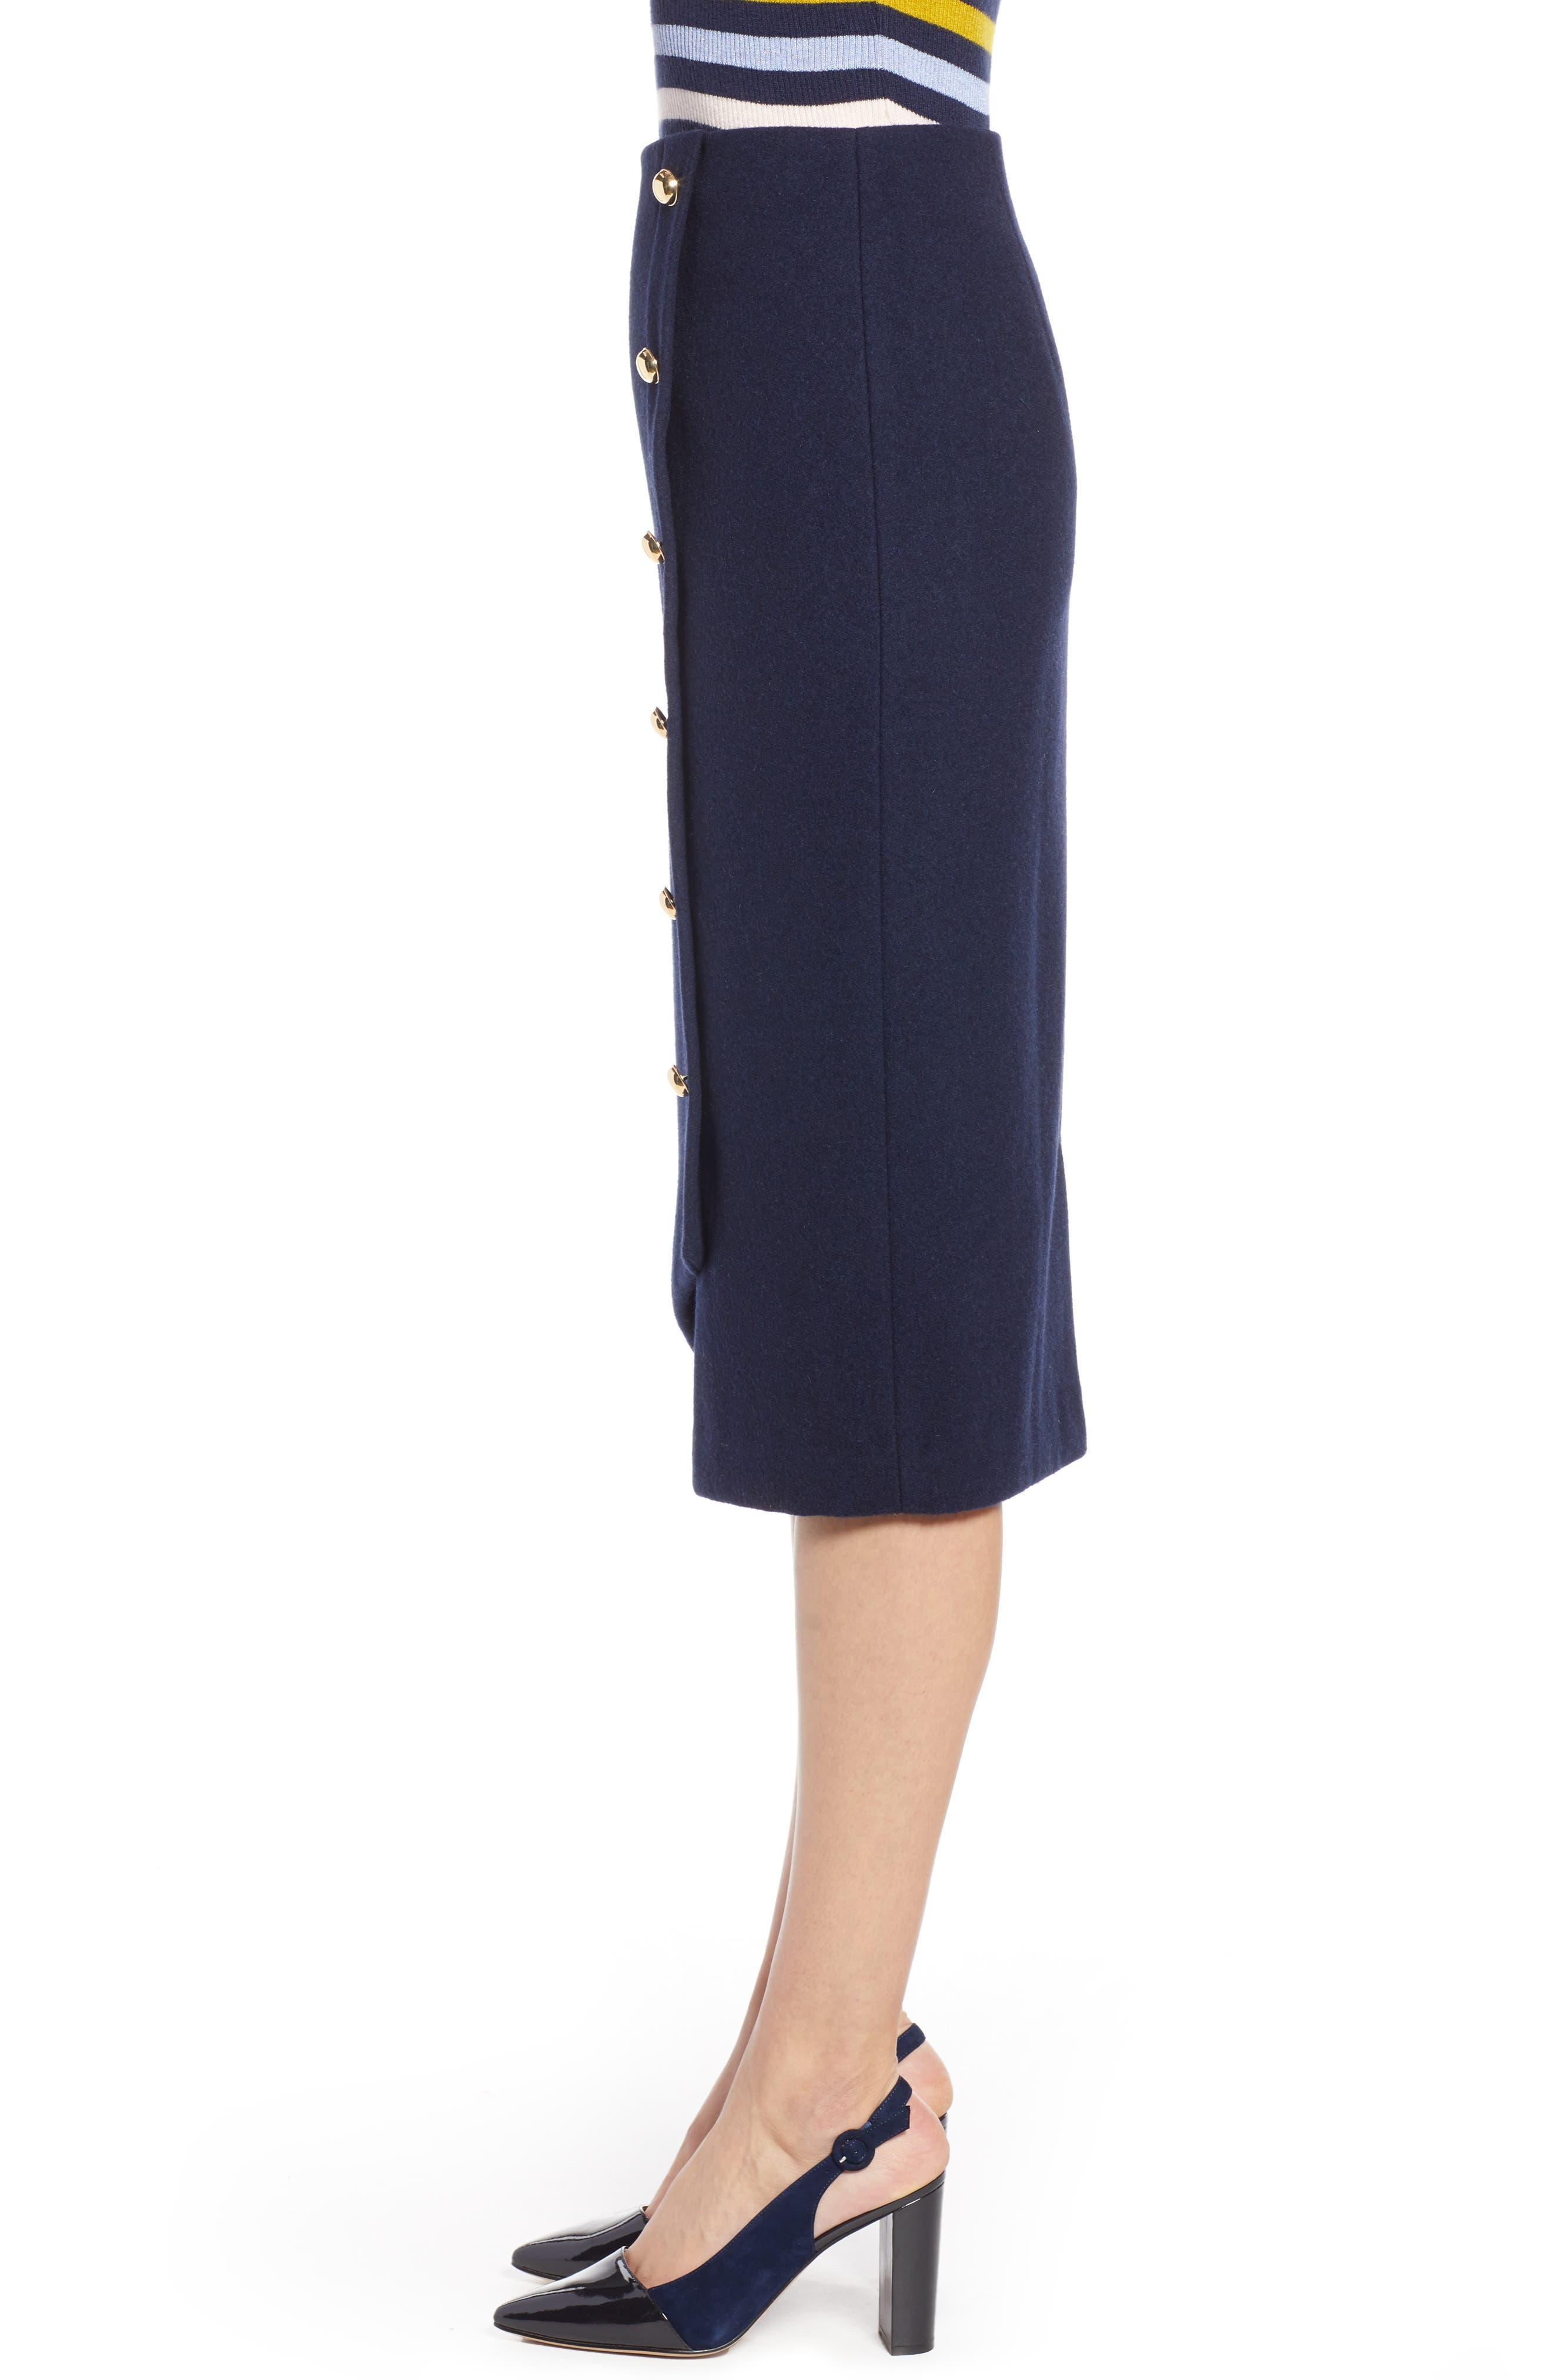 x Atlantic-Pacific Wrap Pencil Skirt,                             Alternate thumbnail 3, color,                             NAVY BLAZER